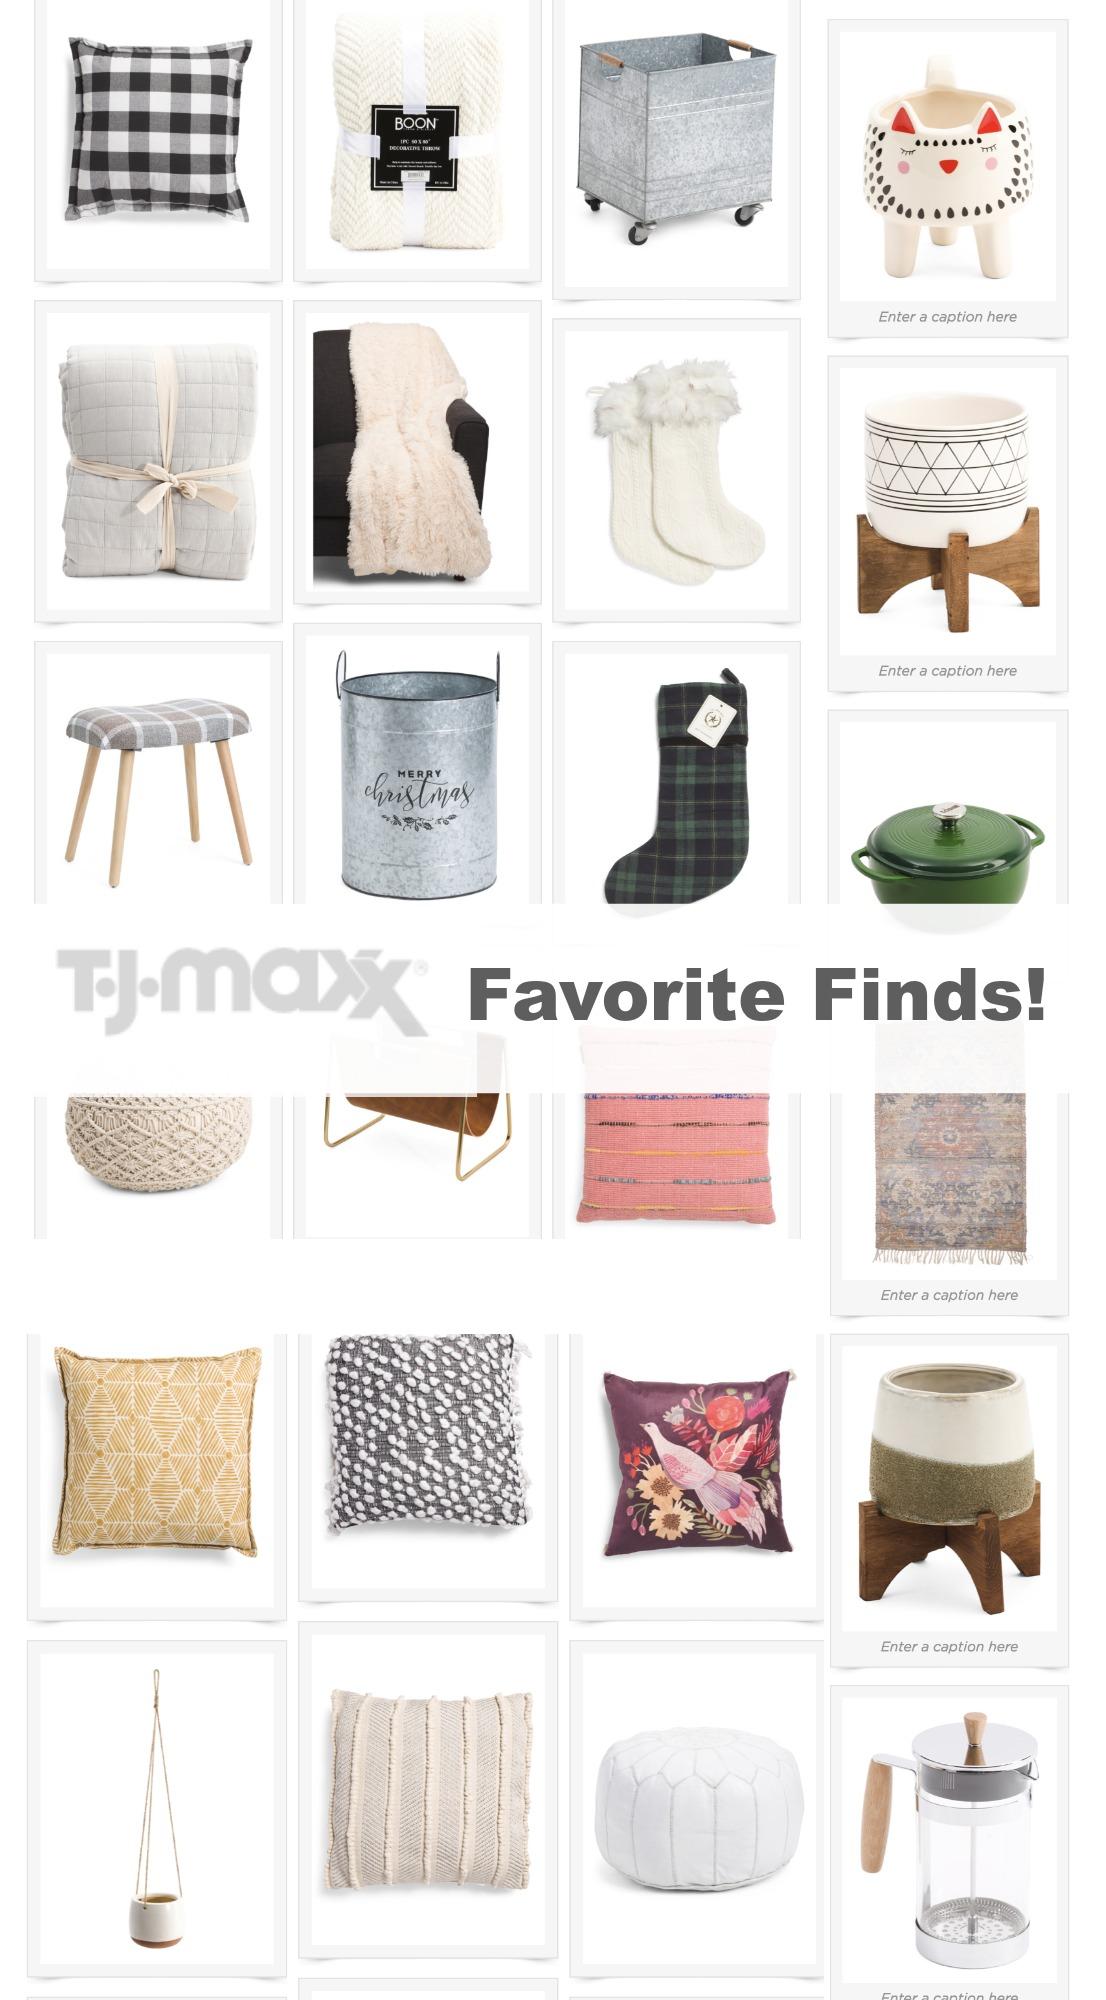 Tj maxx favorite finds online